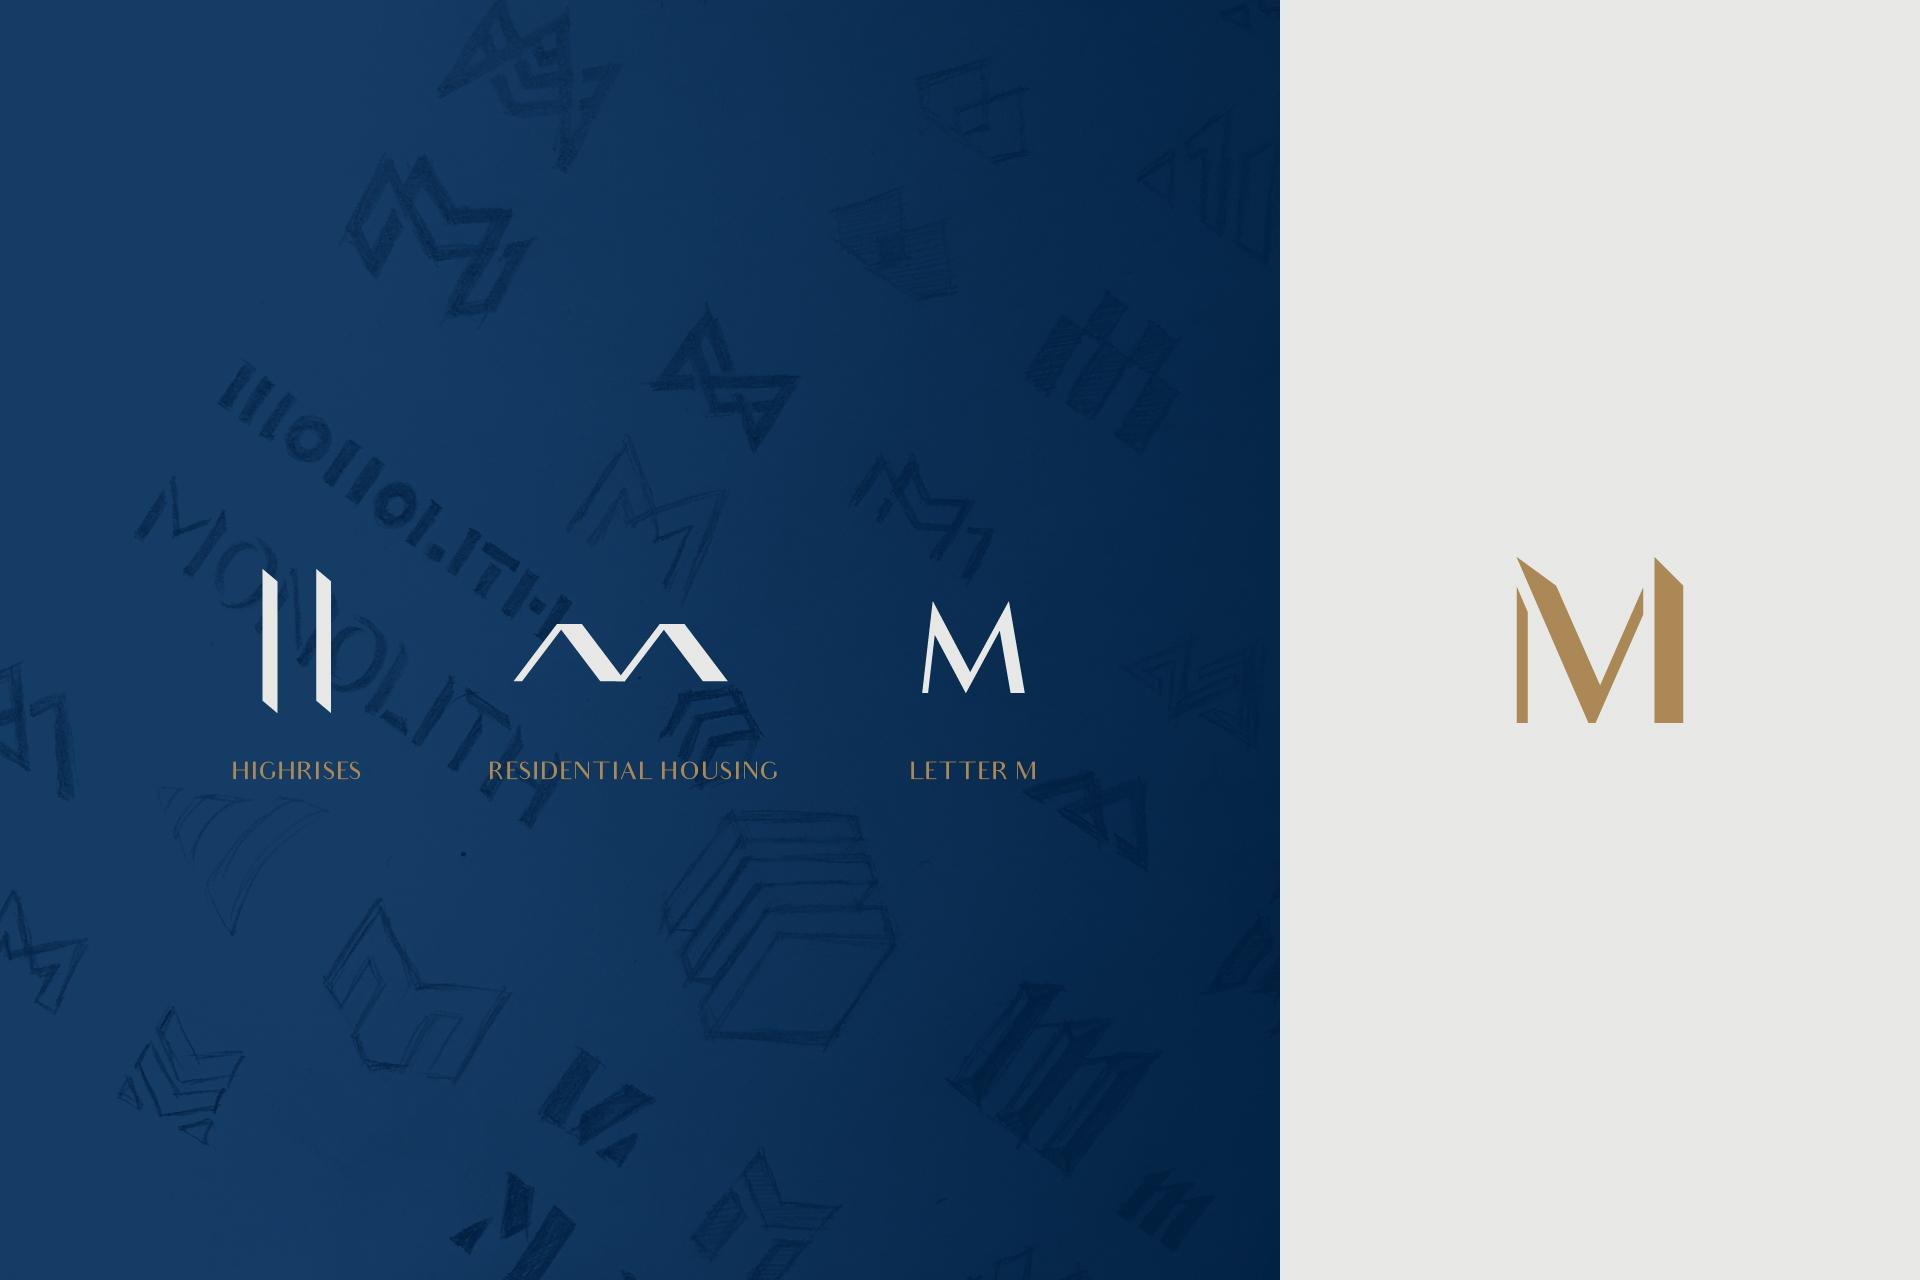 corporate branding by Z Creative Studio Branding & Graphic Design Melbourne